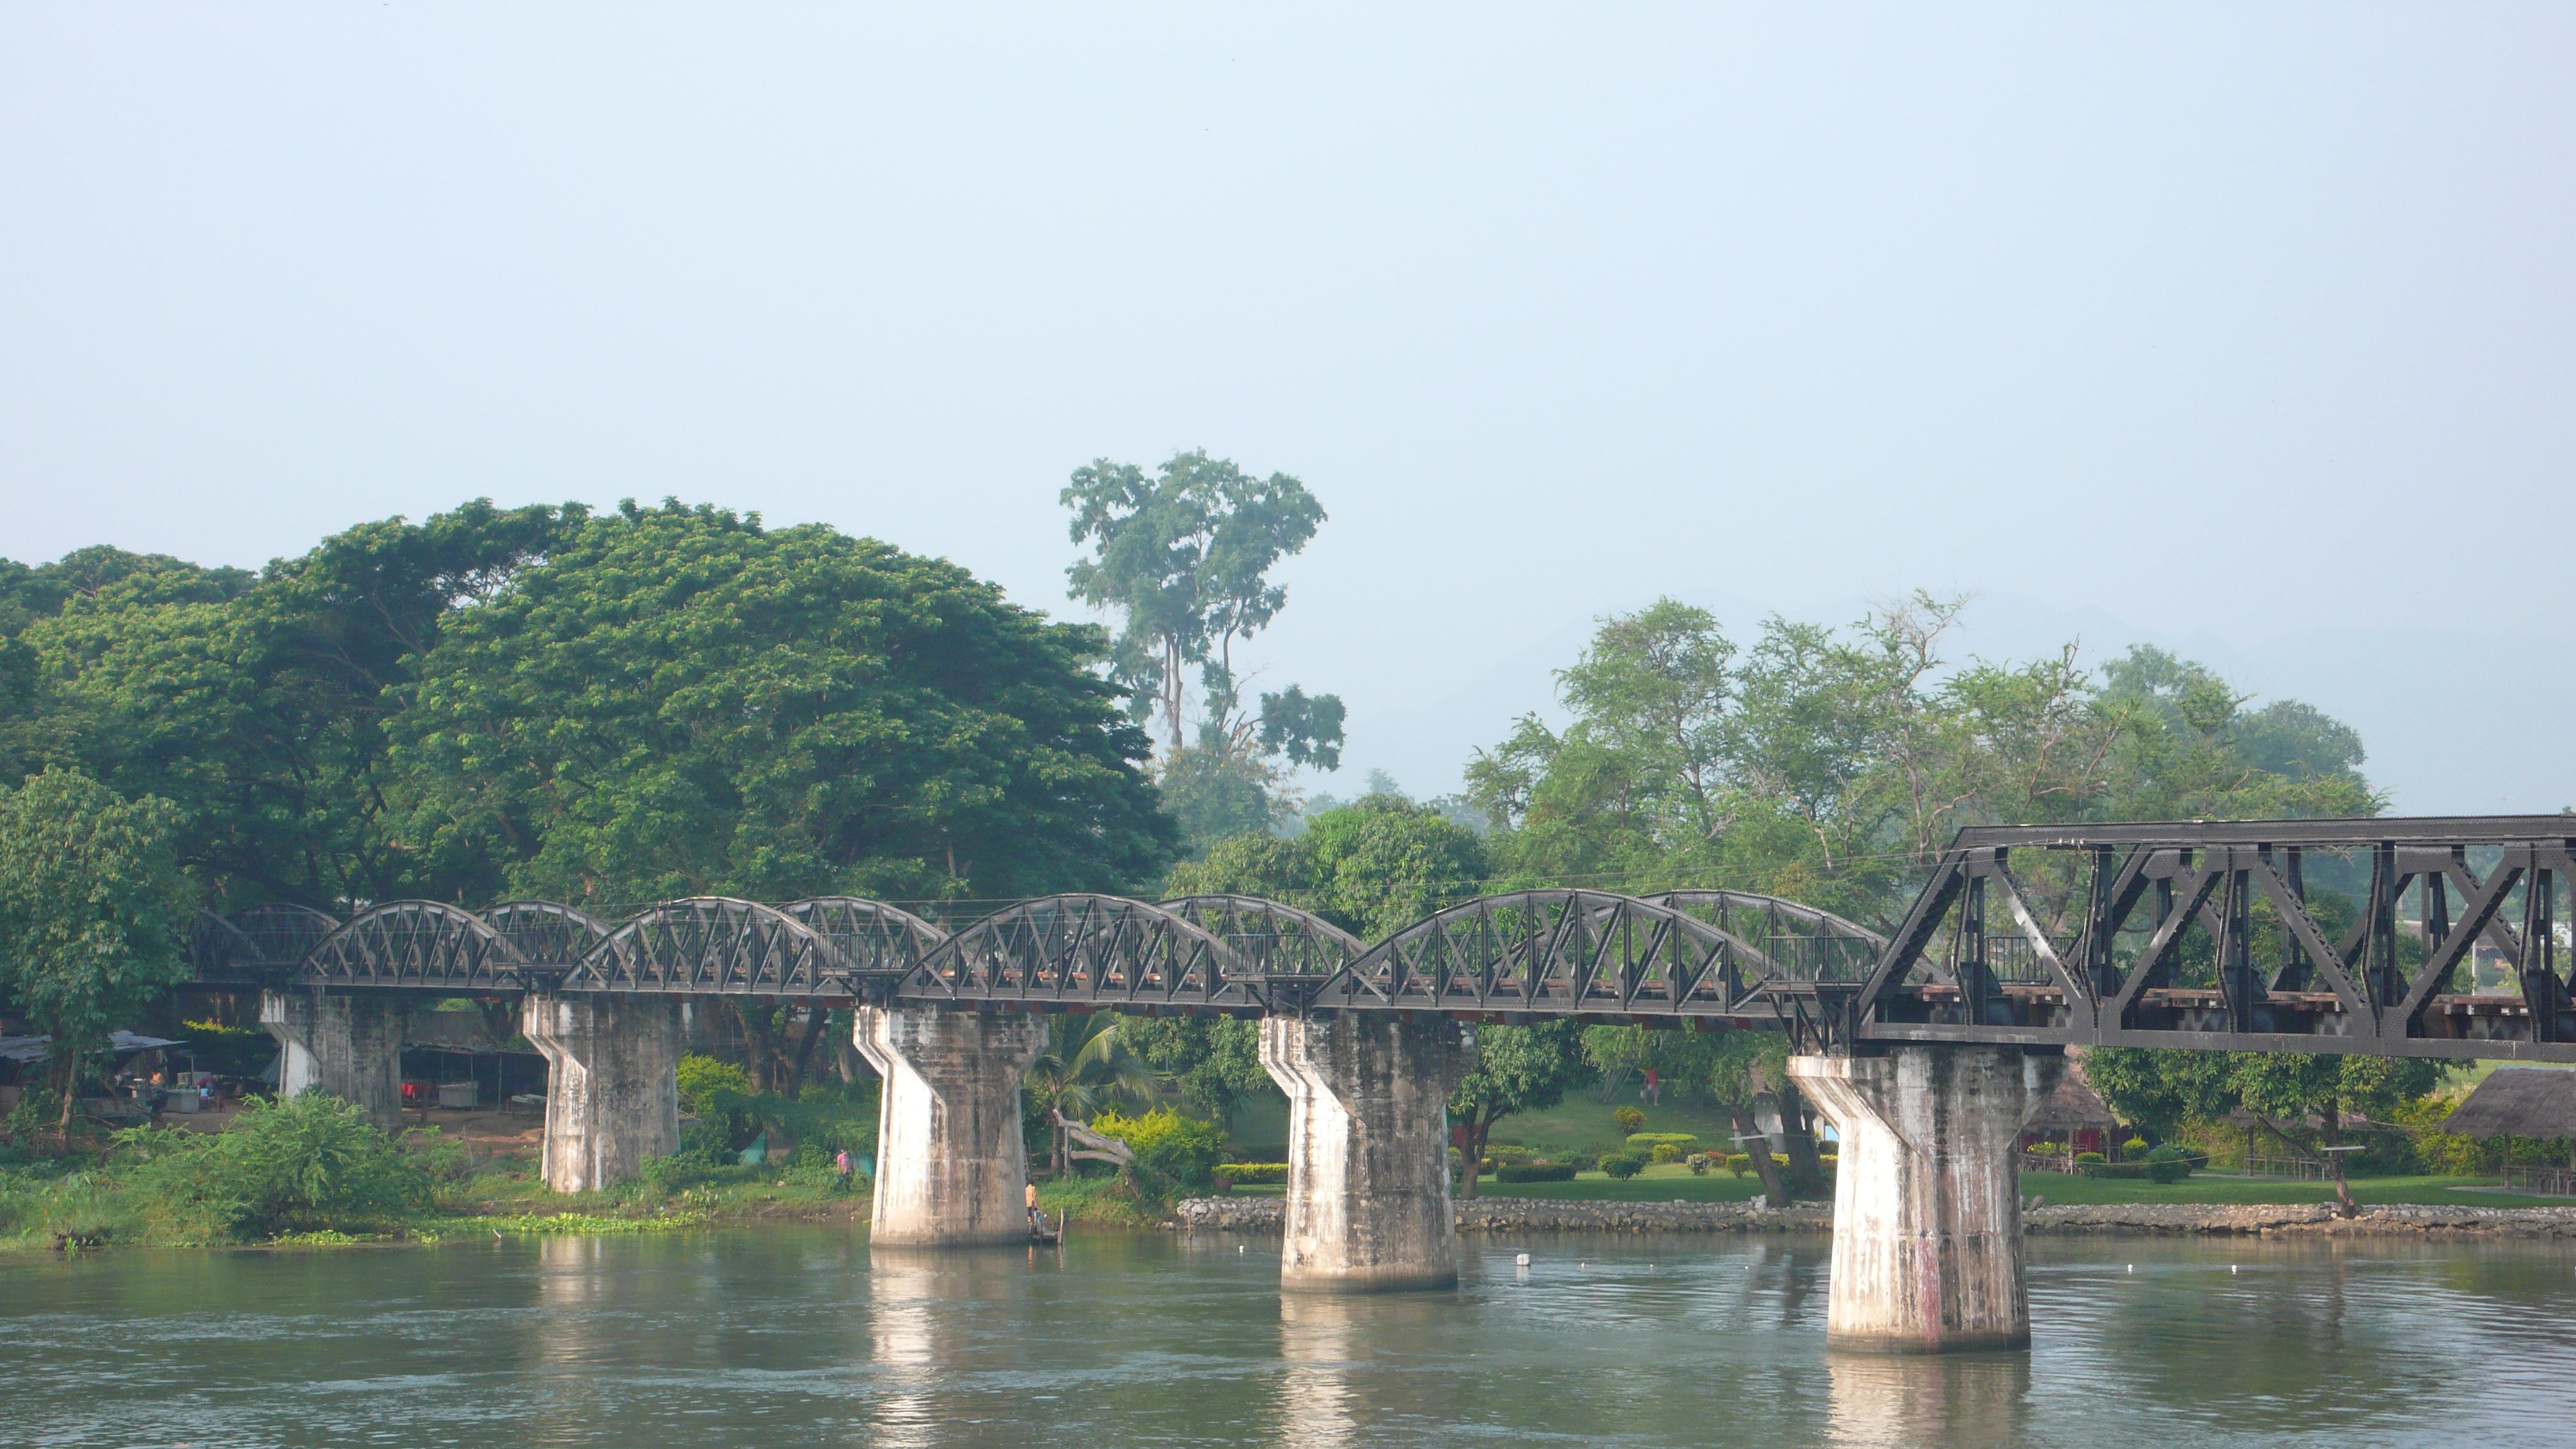 File:Bridge over the river kwai.jpg